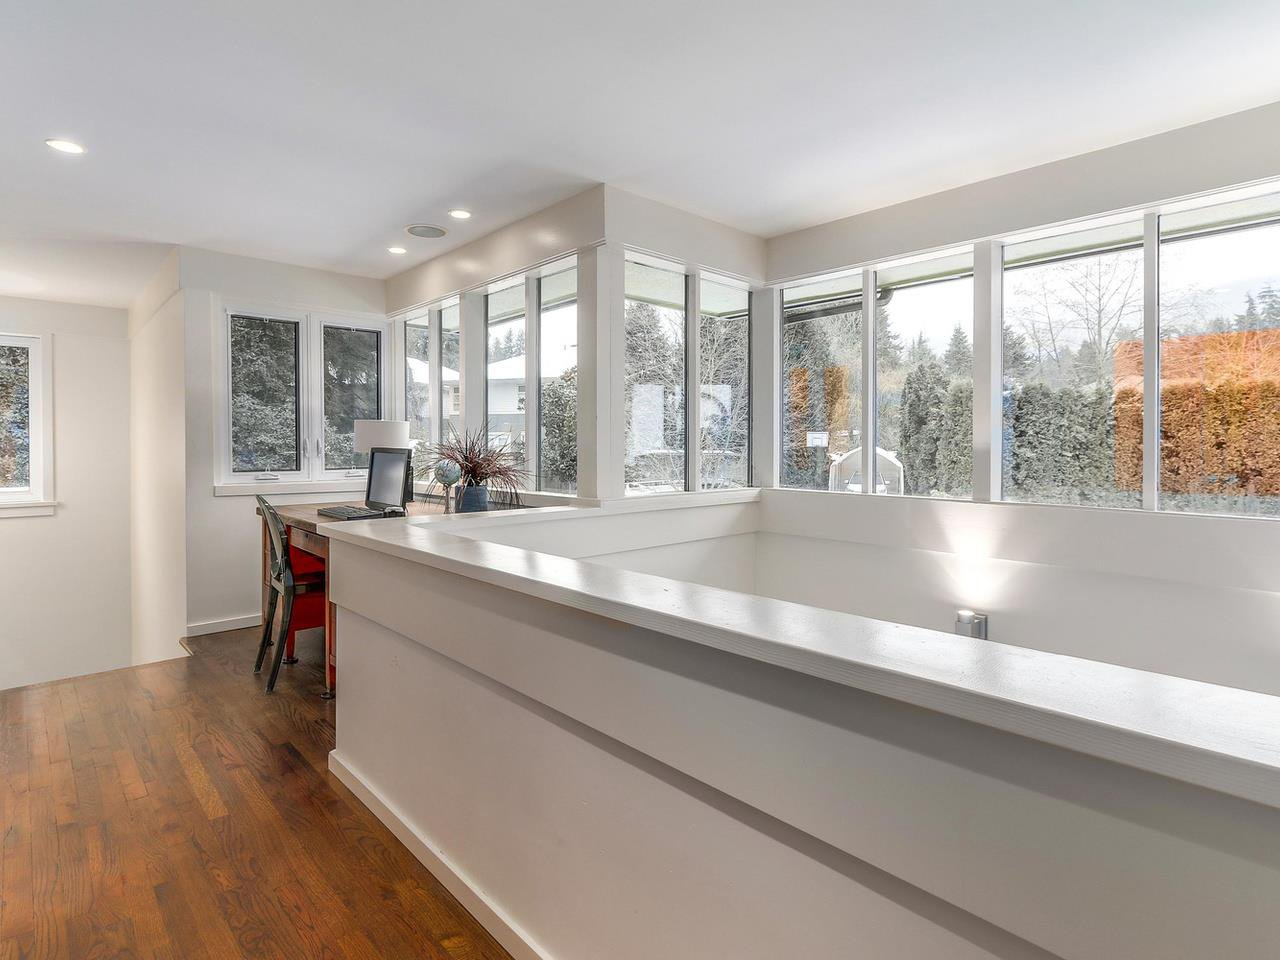 Photo 14: Photos: 3708 EDGEMONT Boulevard in North Vancouver: Edgemont House Fourplex for sale : MLS®# R2138514